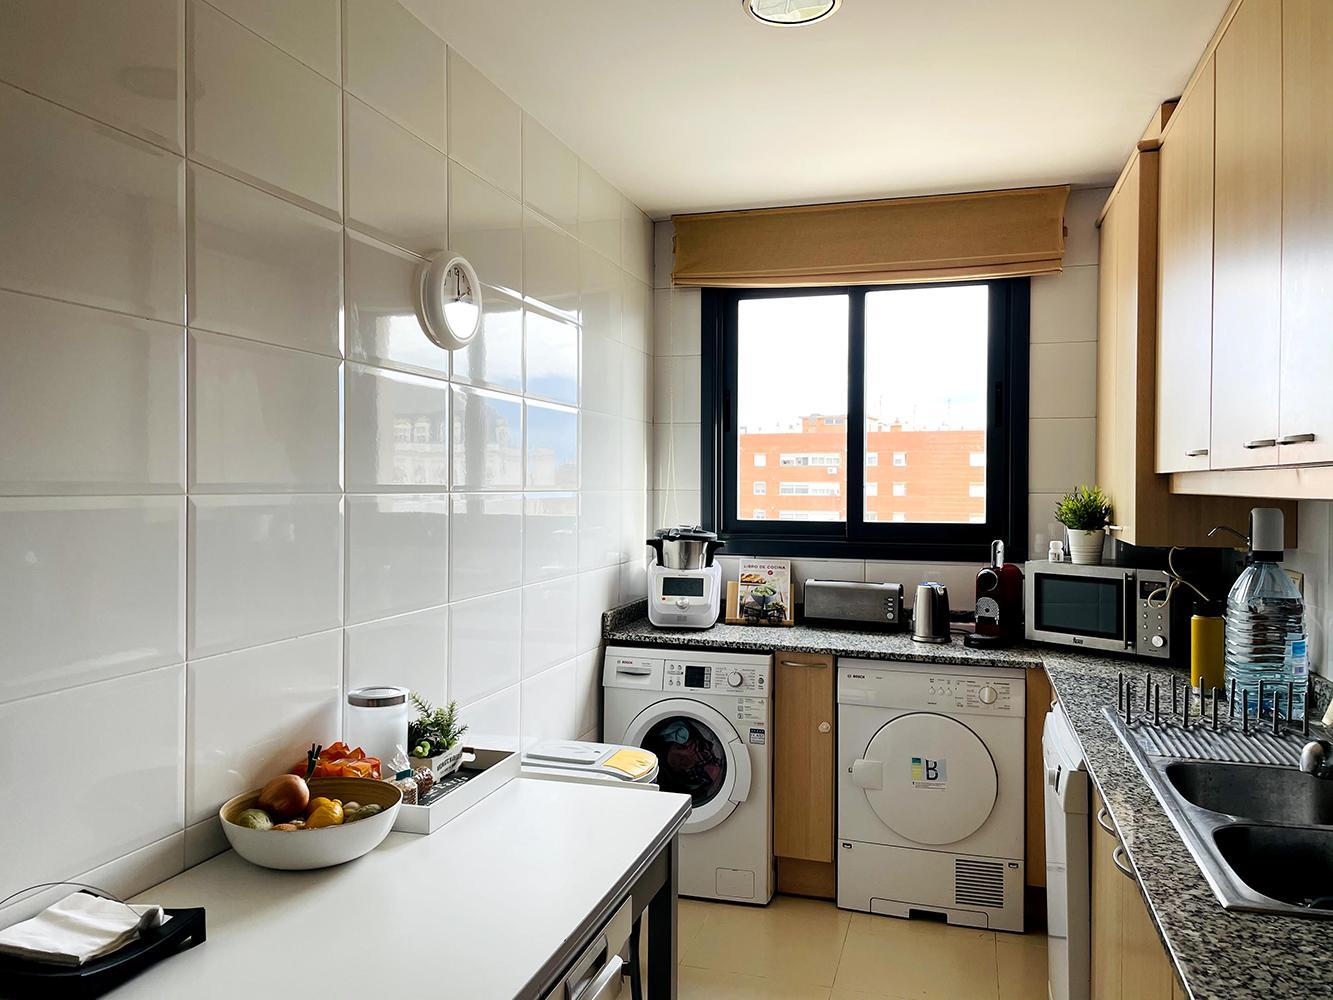 Imagen 3 Piso en alquiler en Barcelona / Pere iv con Bilbao